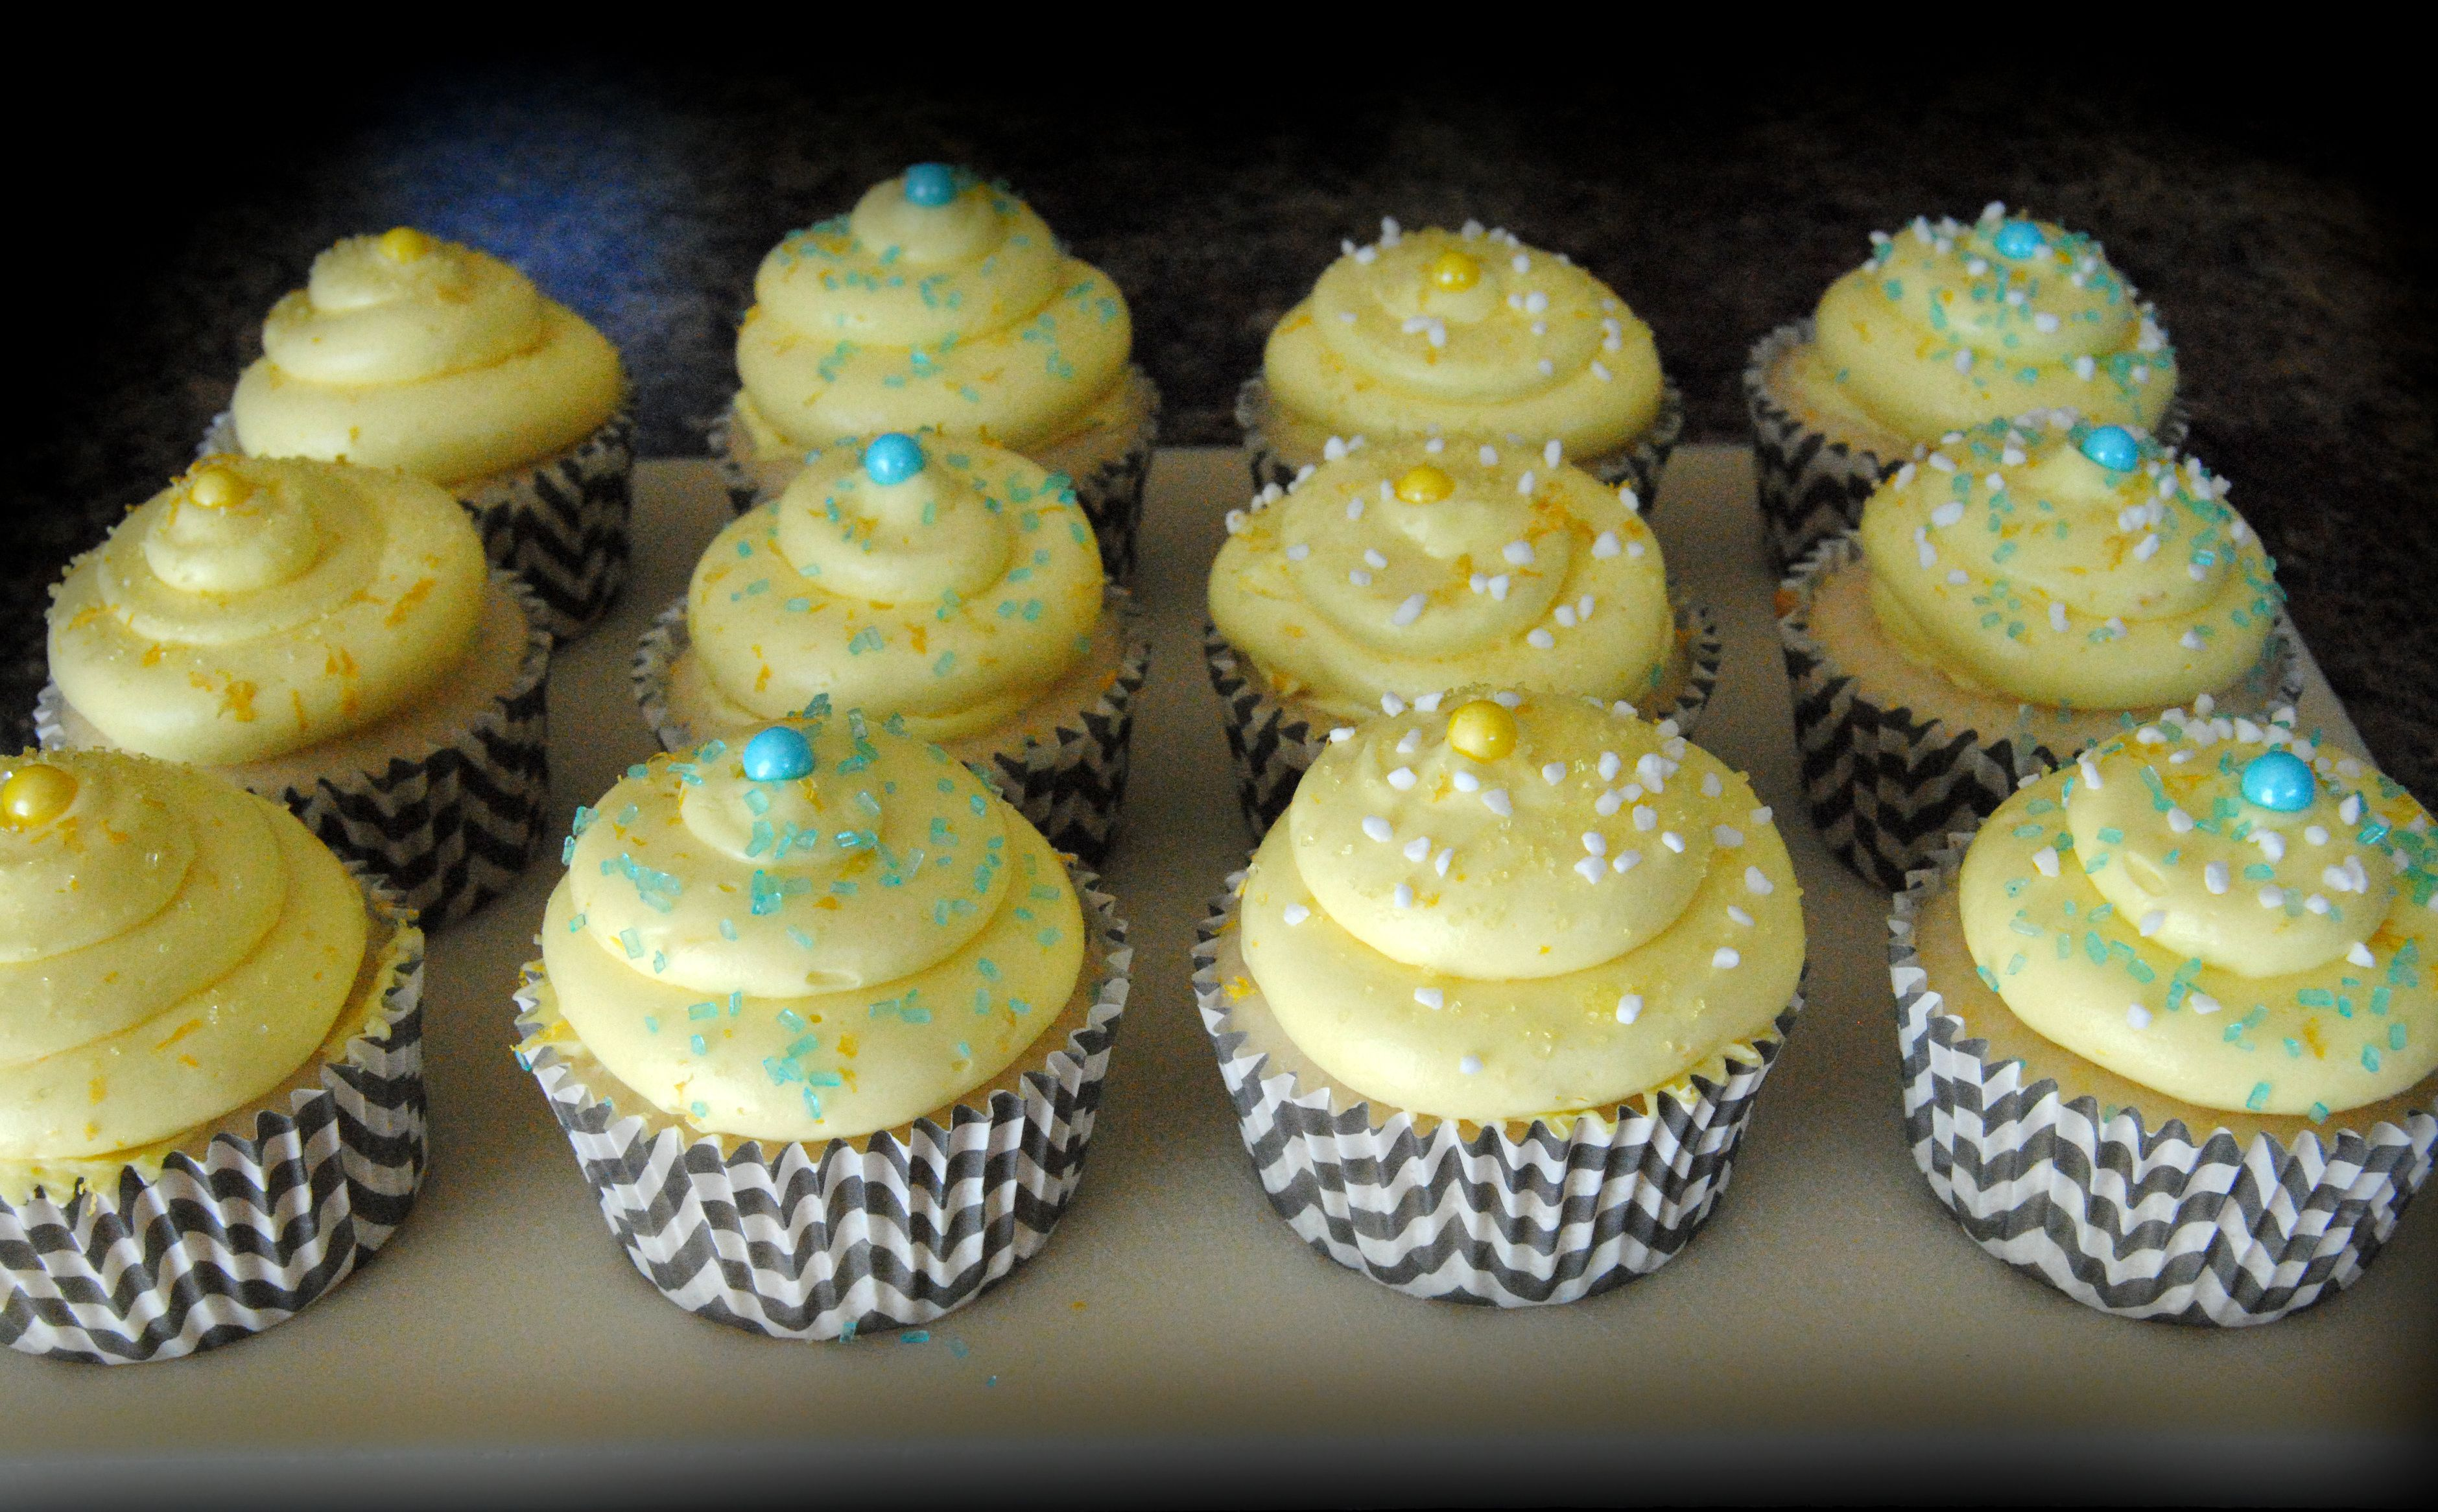 Aqua, yellow & grey chevron stripe Baby Shower Cupcakes - Lemon Cupcakes - Baby Shower - ORDER CUSTOM CUPCAKES in Kenosha, WI & Northern IL... Birthday - Shower - Baby - Wedding - graduation - party - all occasions - holidays - https://www.facebook.com/StefsEvents